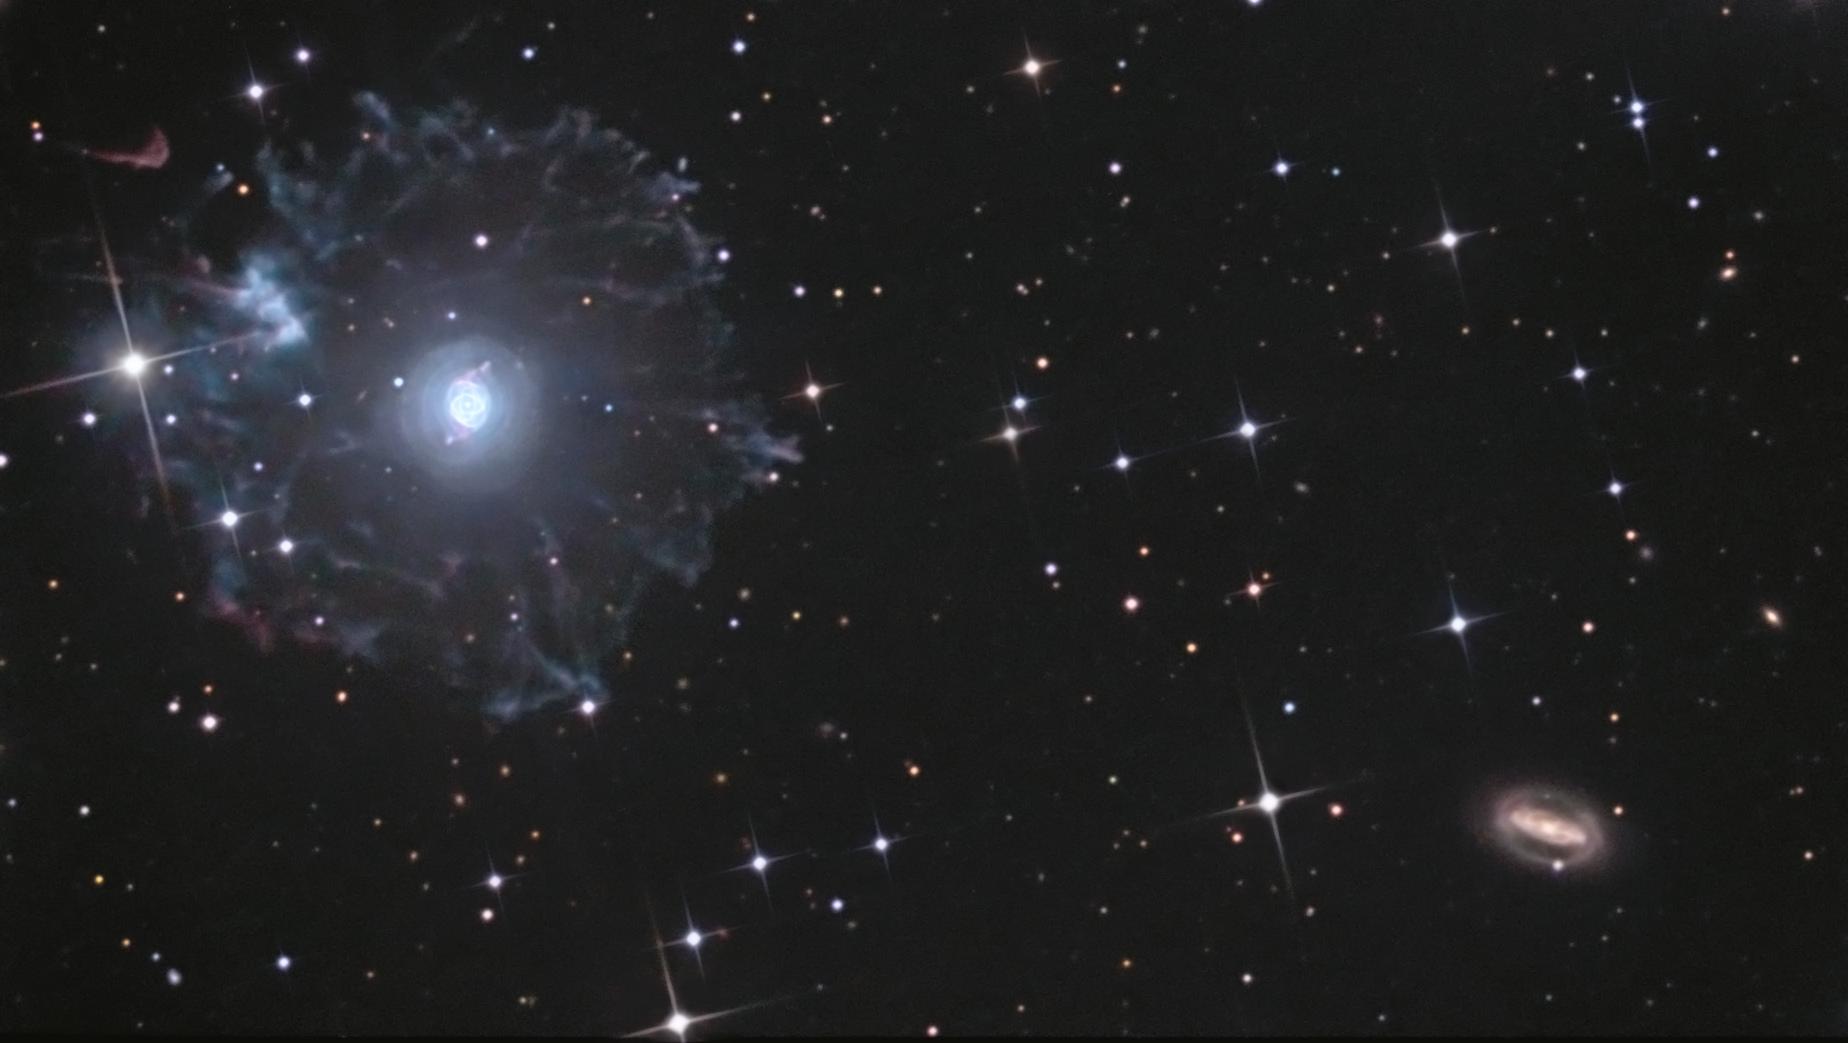 5fdf2489758c9_NGC6543_totalefinal6.jpg.7234d596bf605af239597268d9ee1e8c.jpg